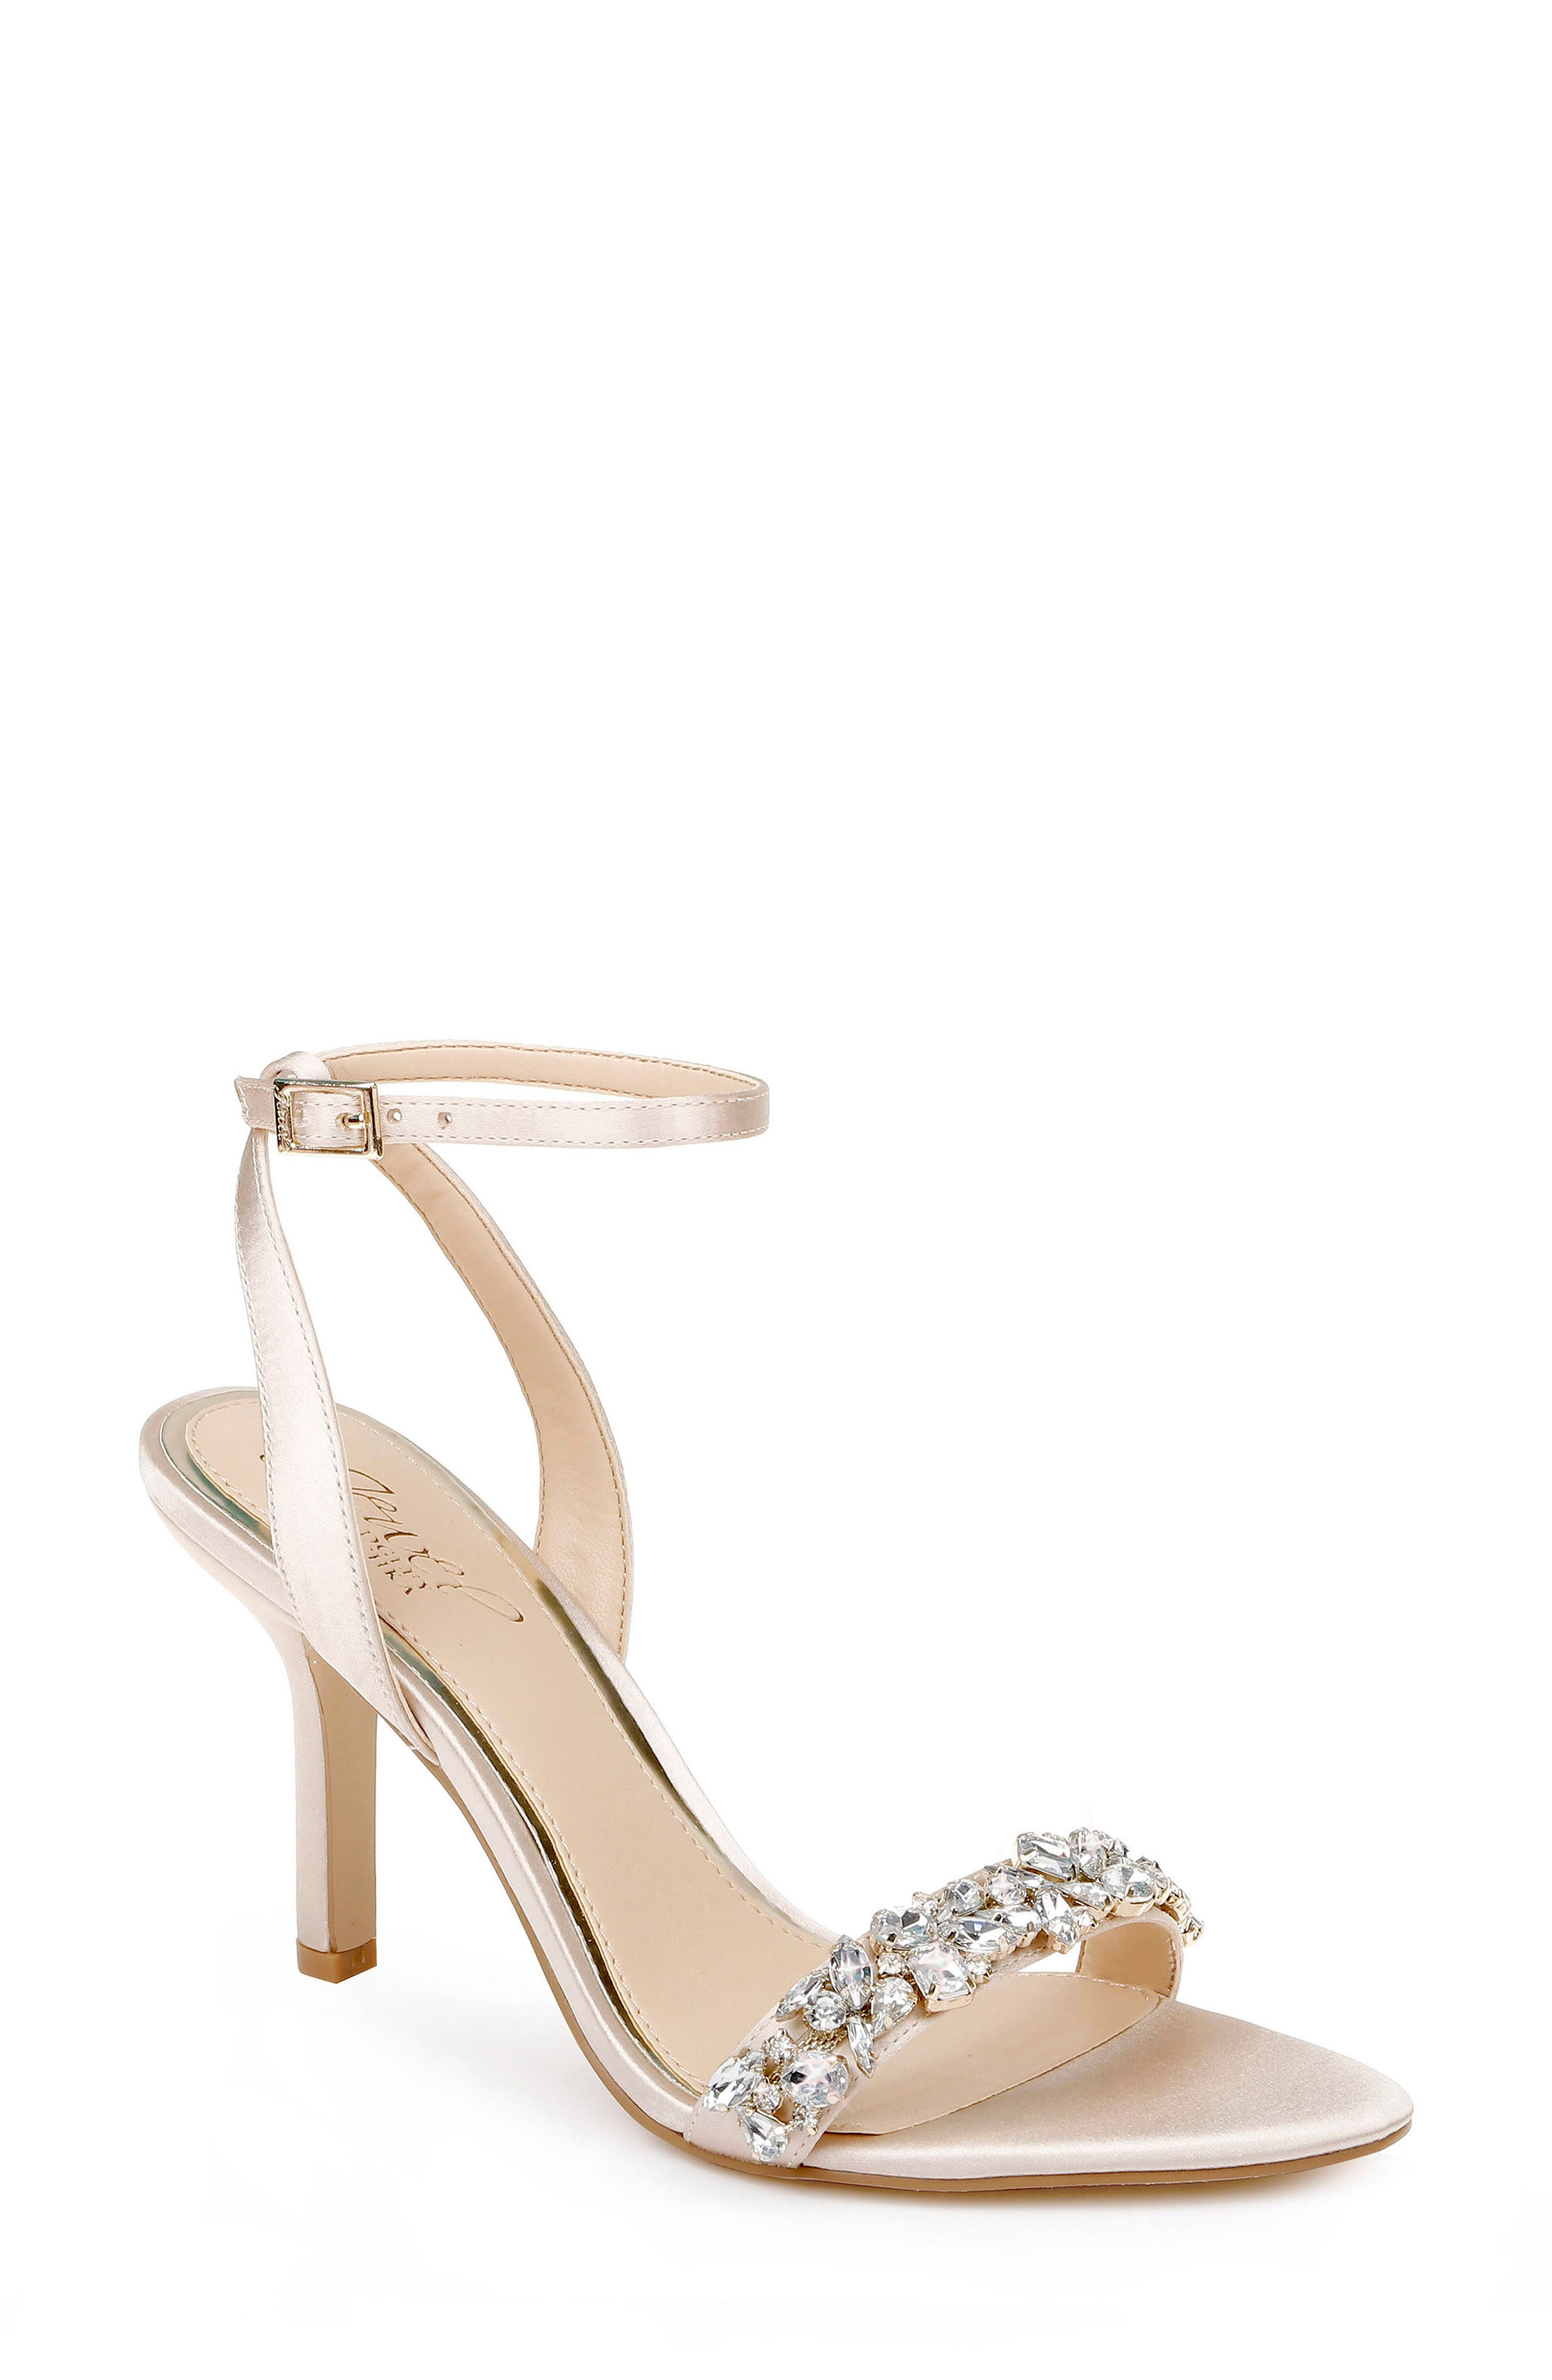 Ojai Crystal Ankle Strap Sandal